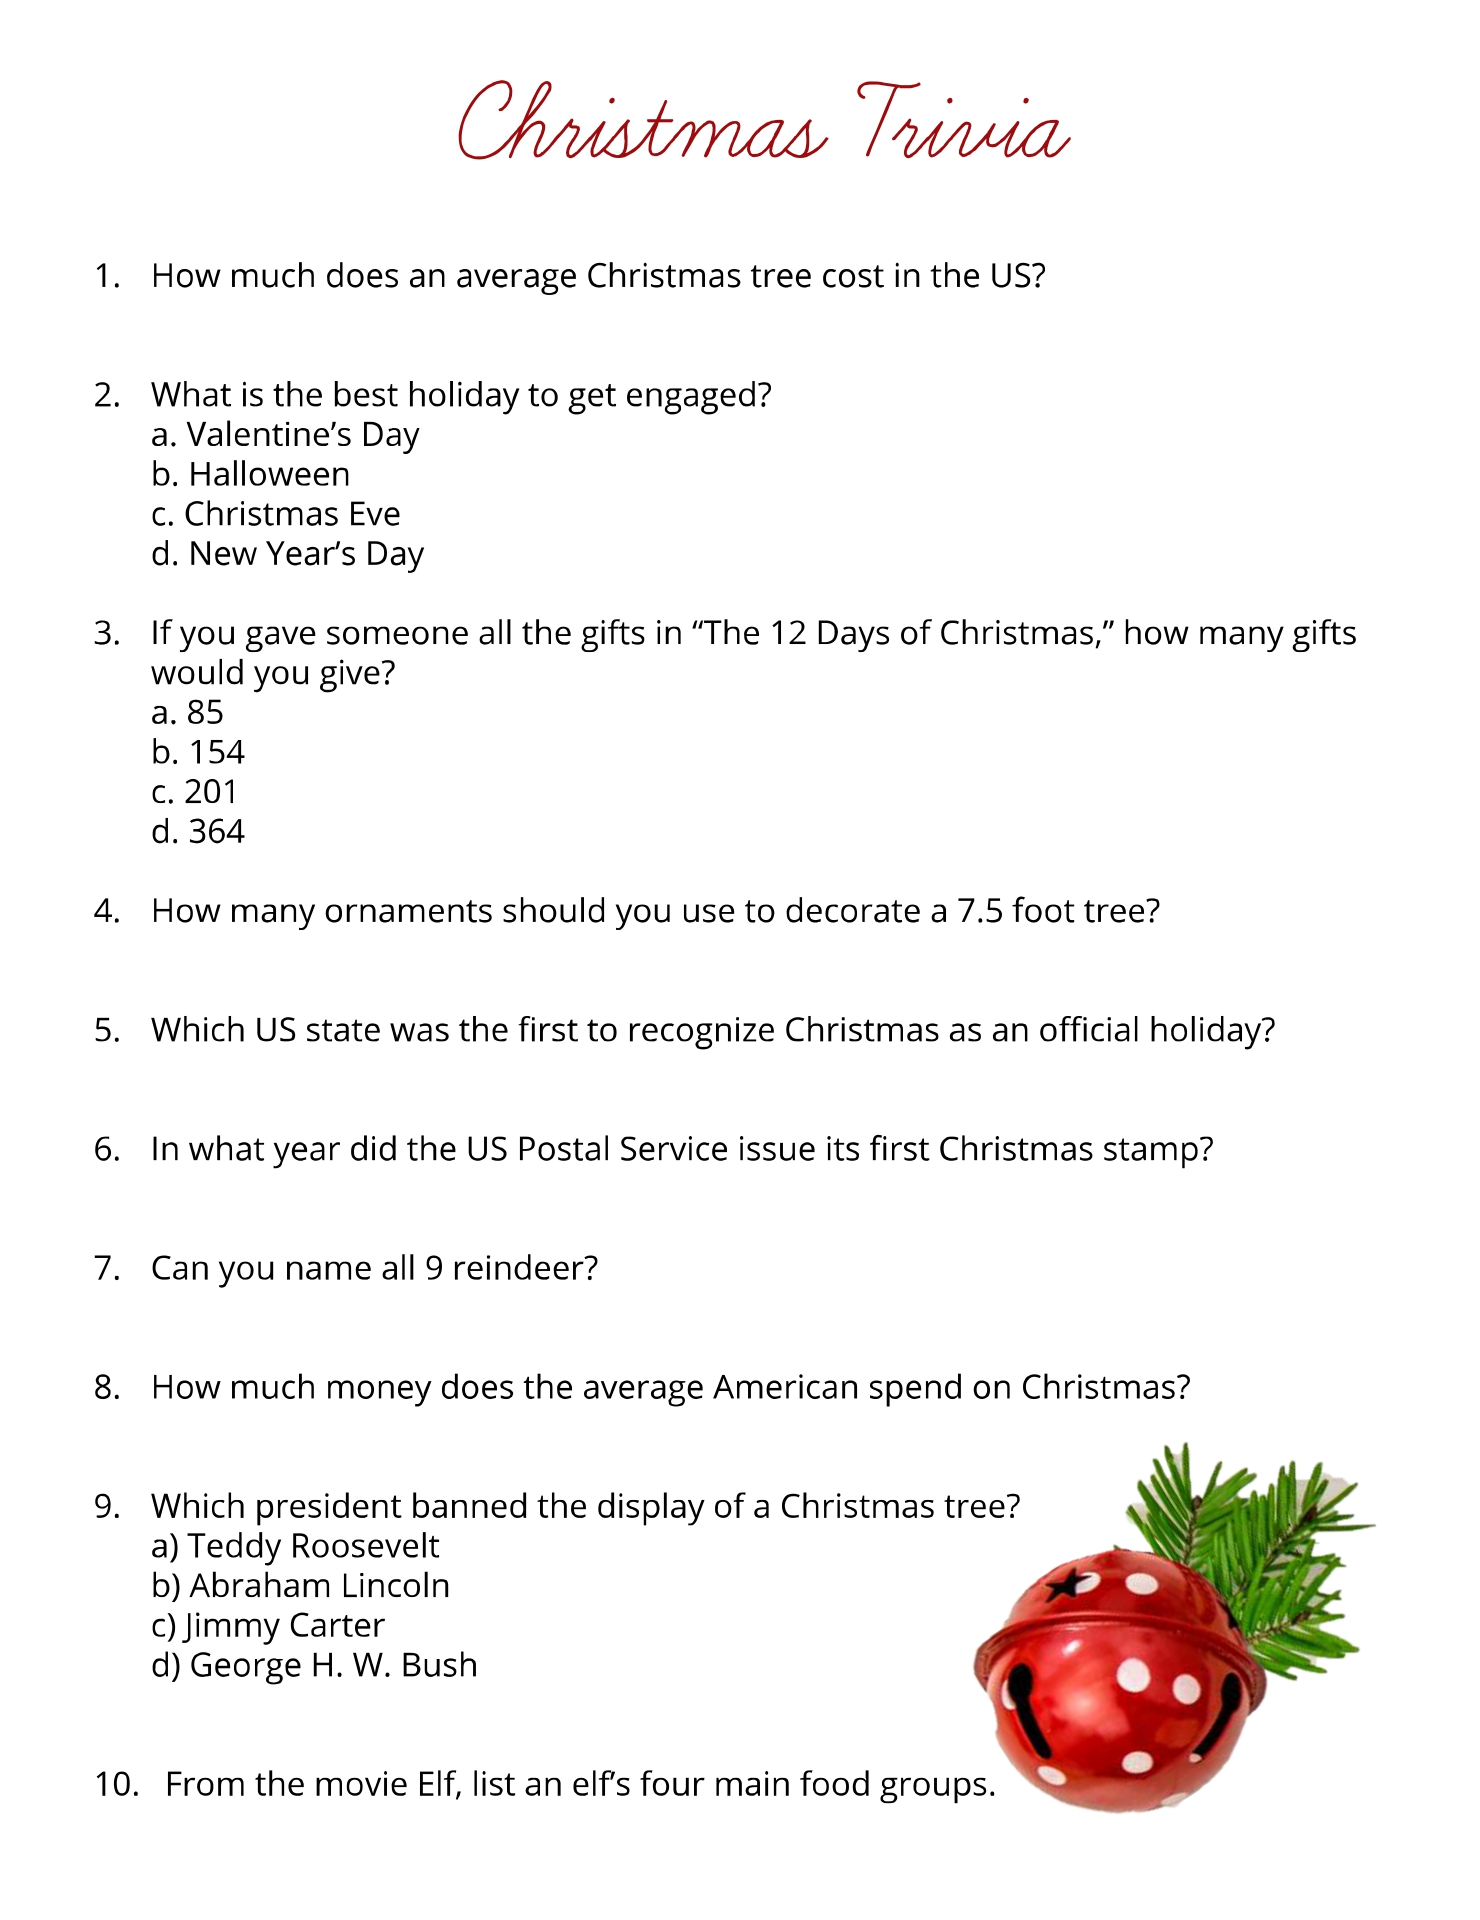 Printable Christmas Trivia Questions